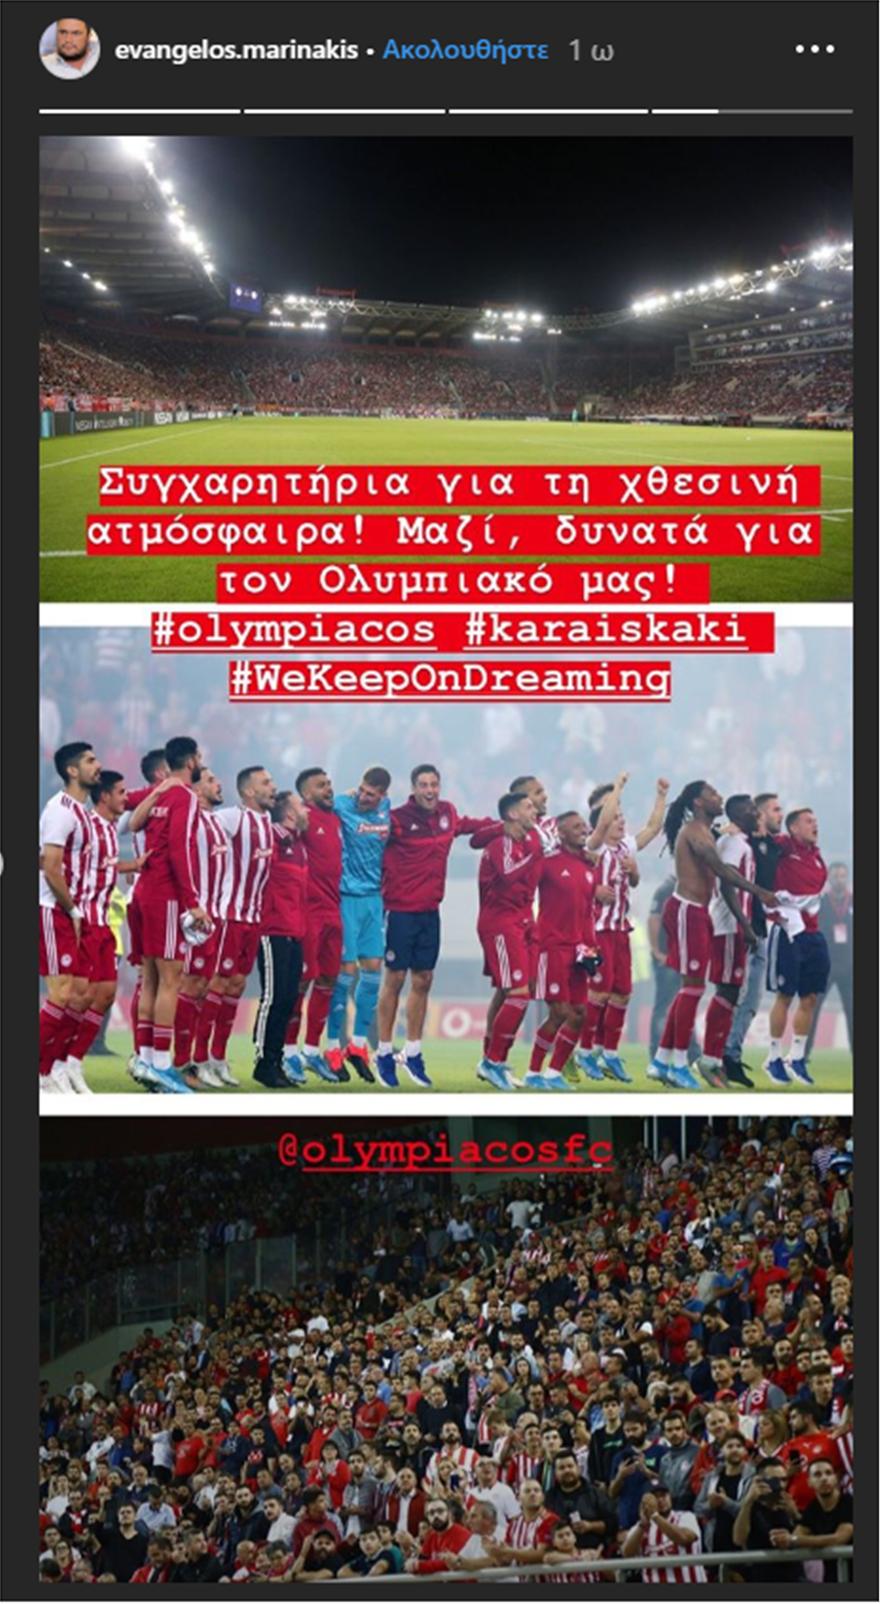 Marinakis2